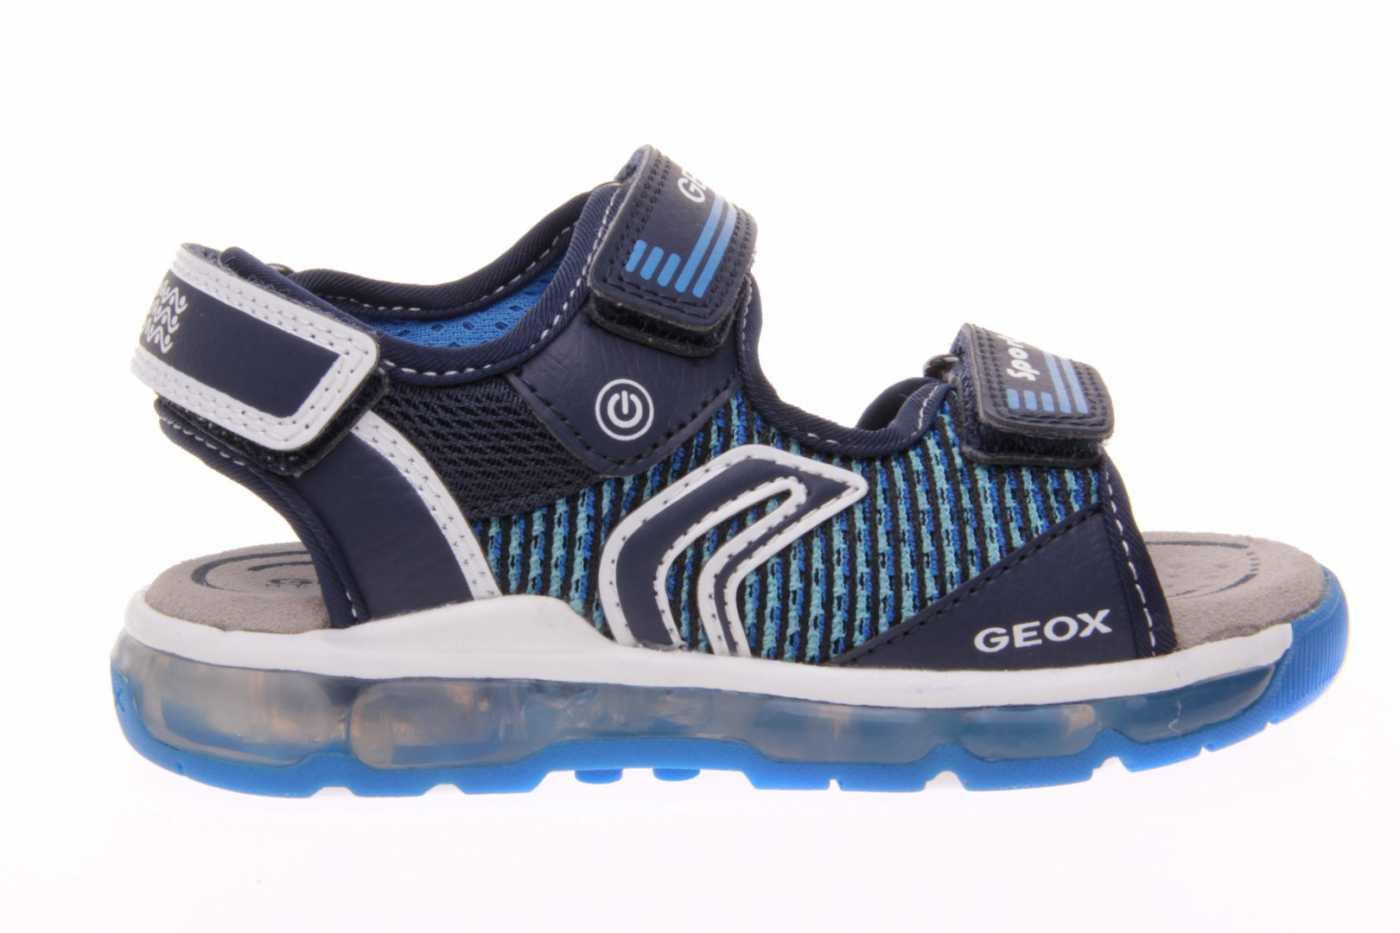 Resonar giratorio corrupción  Comprar zapato GEOX para JOVEN NIÑO estilo SANDALIA color AZUL MARINO PIEL